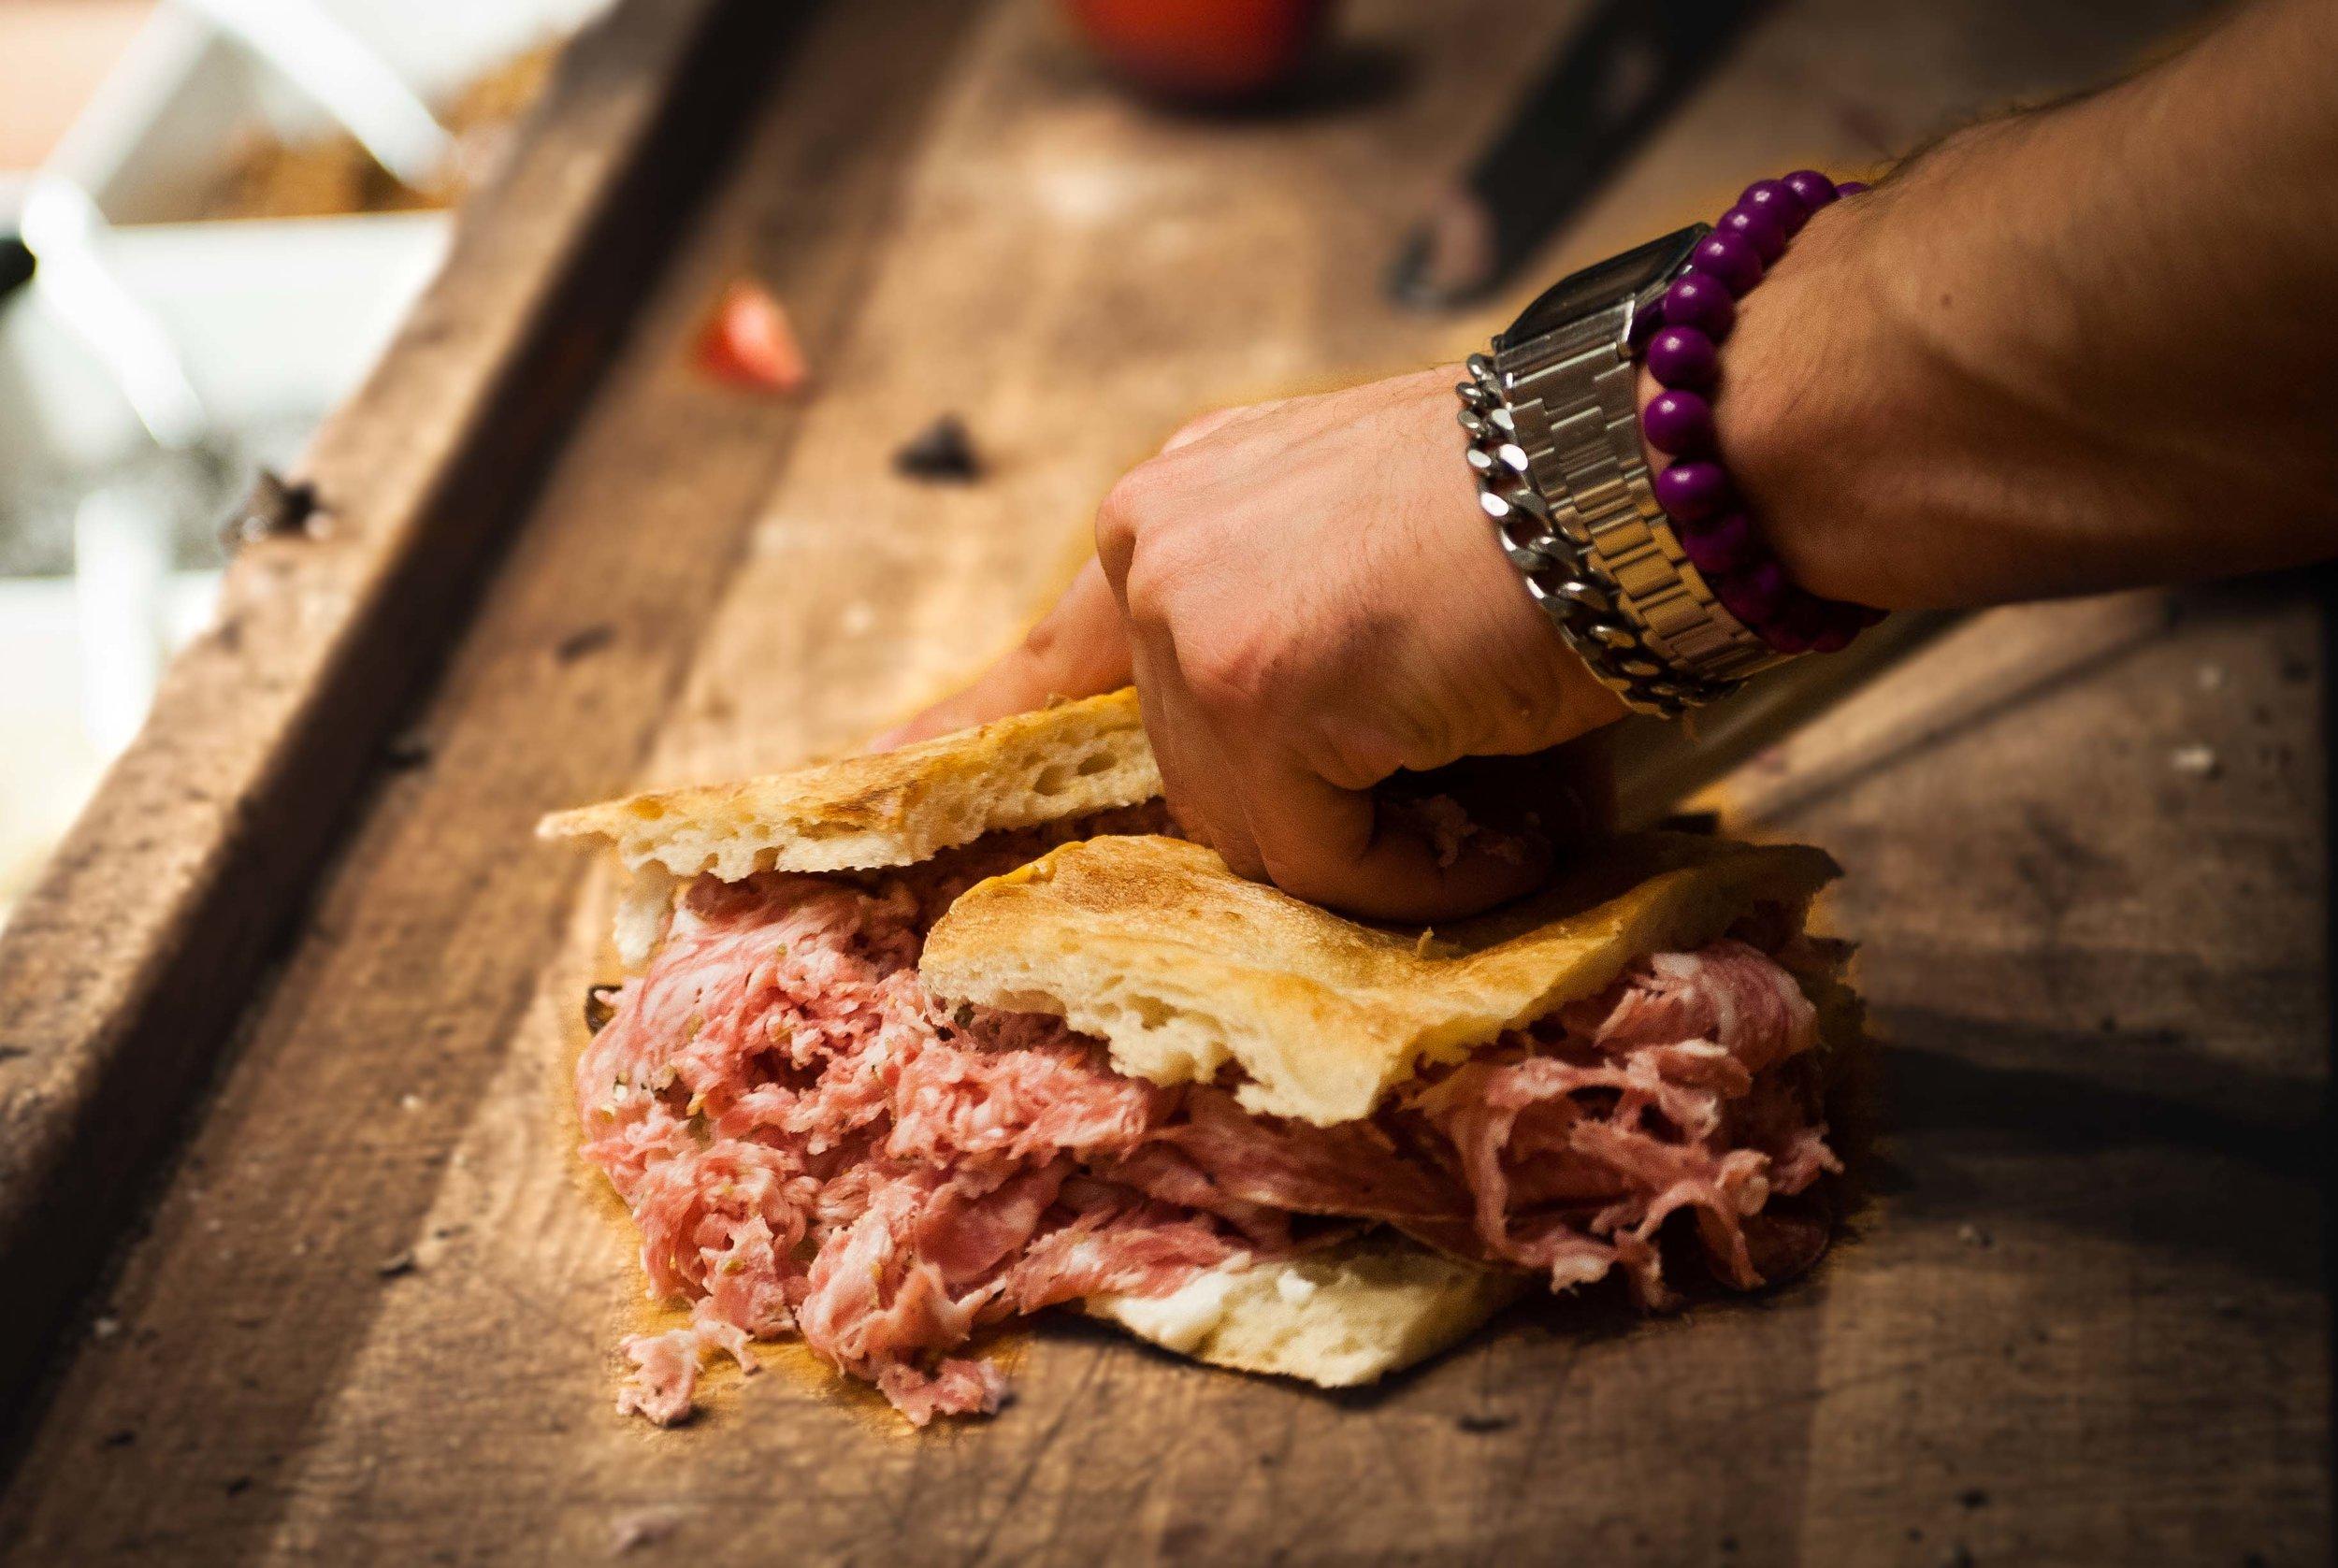 Florence-All'antica-making-sandwich.jpg